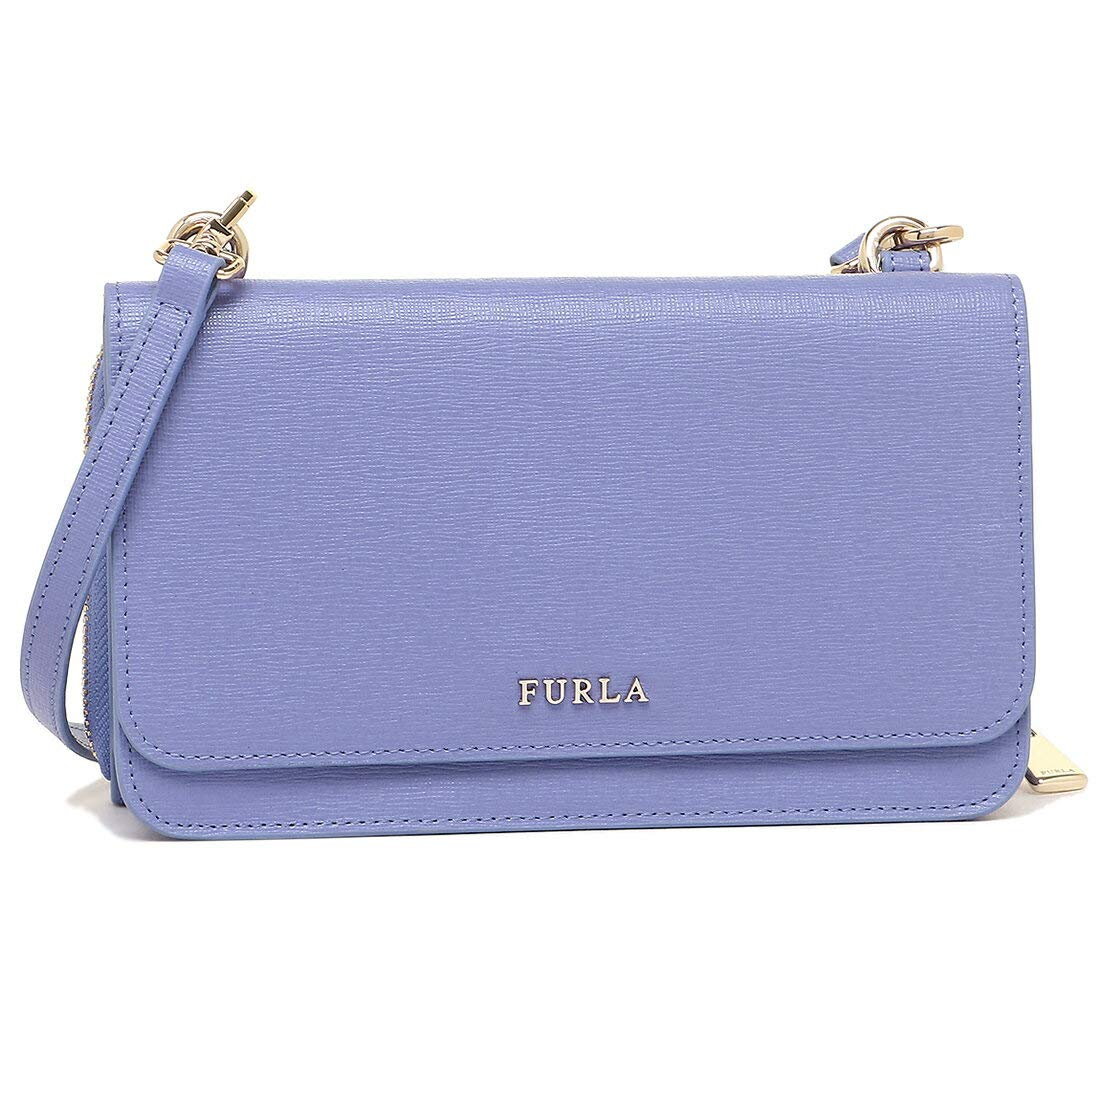 8adda7ac2040 フルラお財布ポシェットでは一番人気!長財布とクラッチバッグを単独でも ...